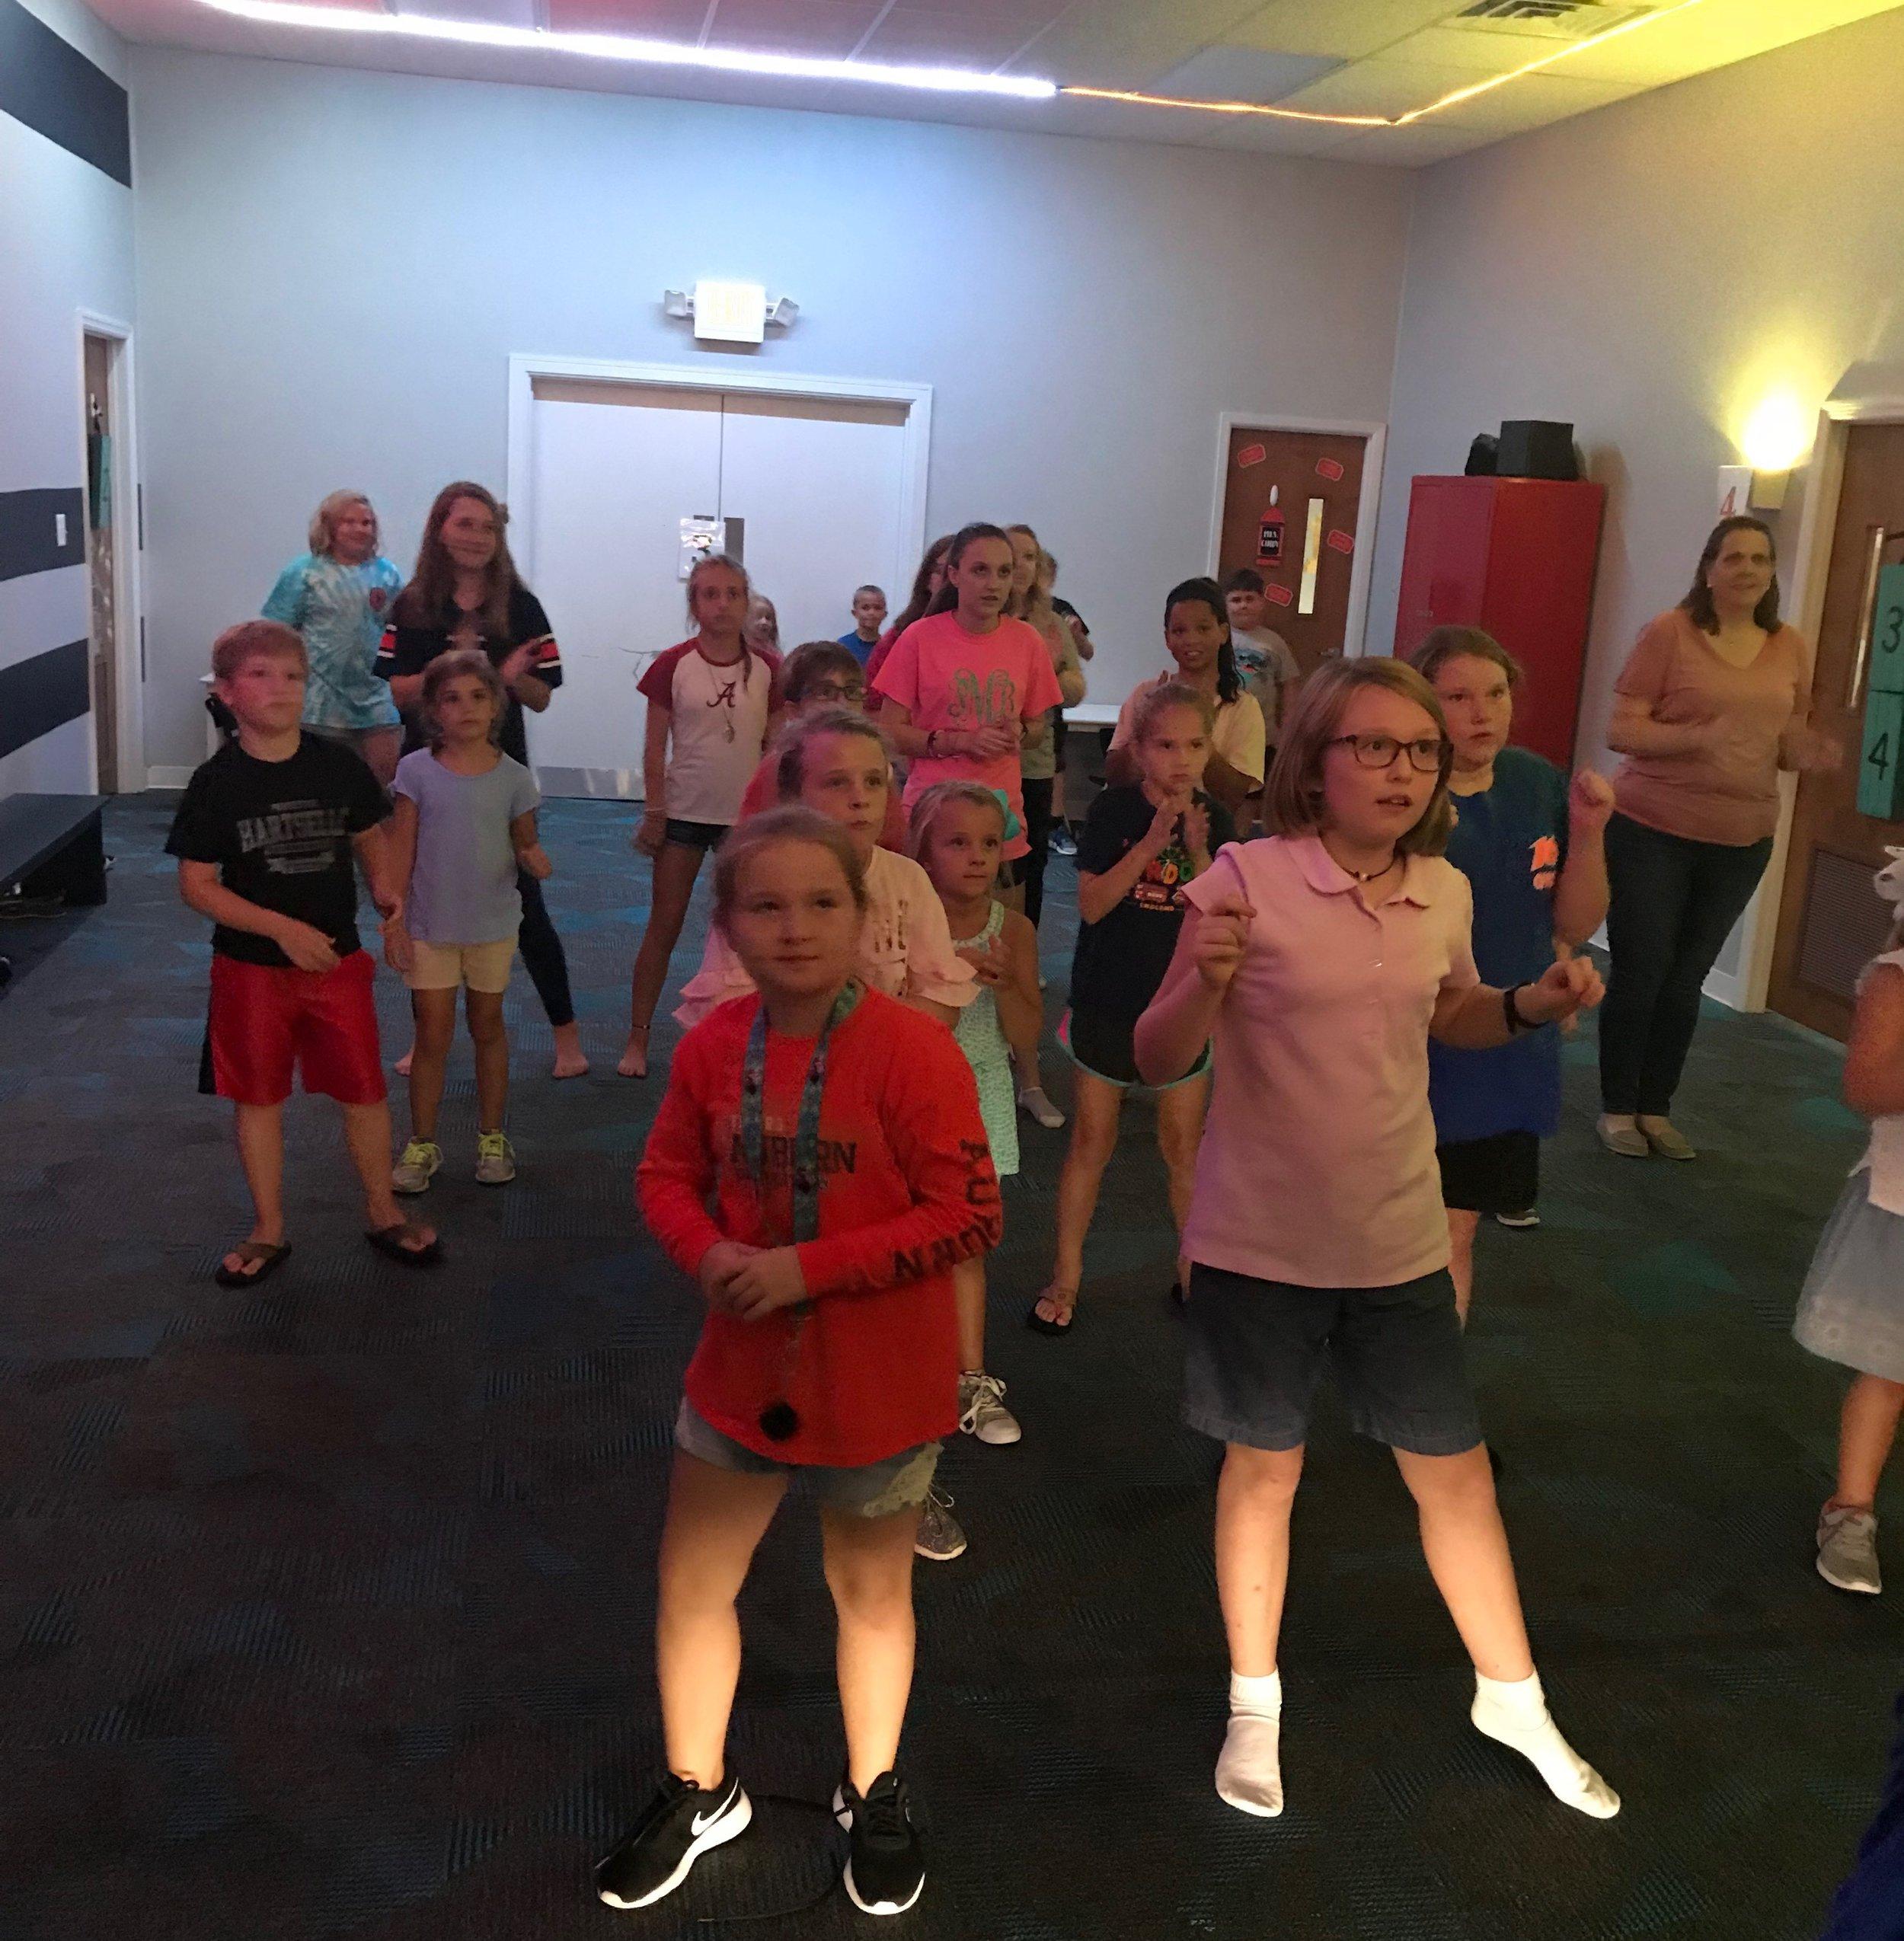 Kids - 6:00 PM, Children's Suite